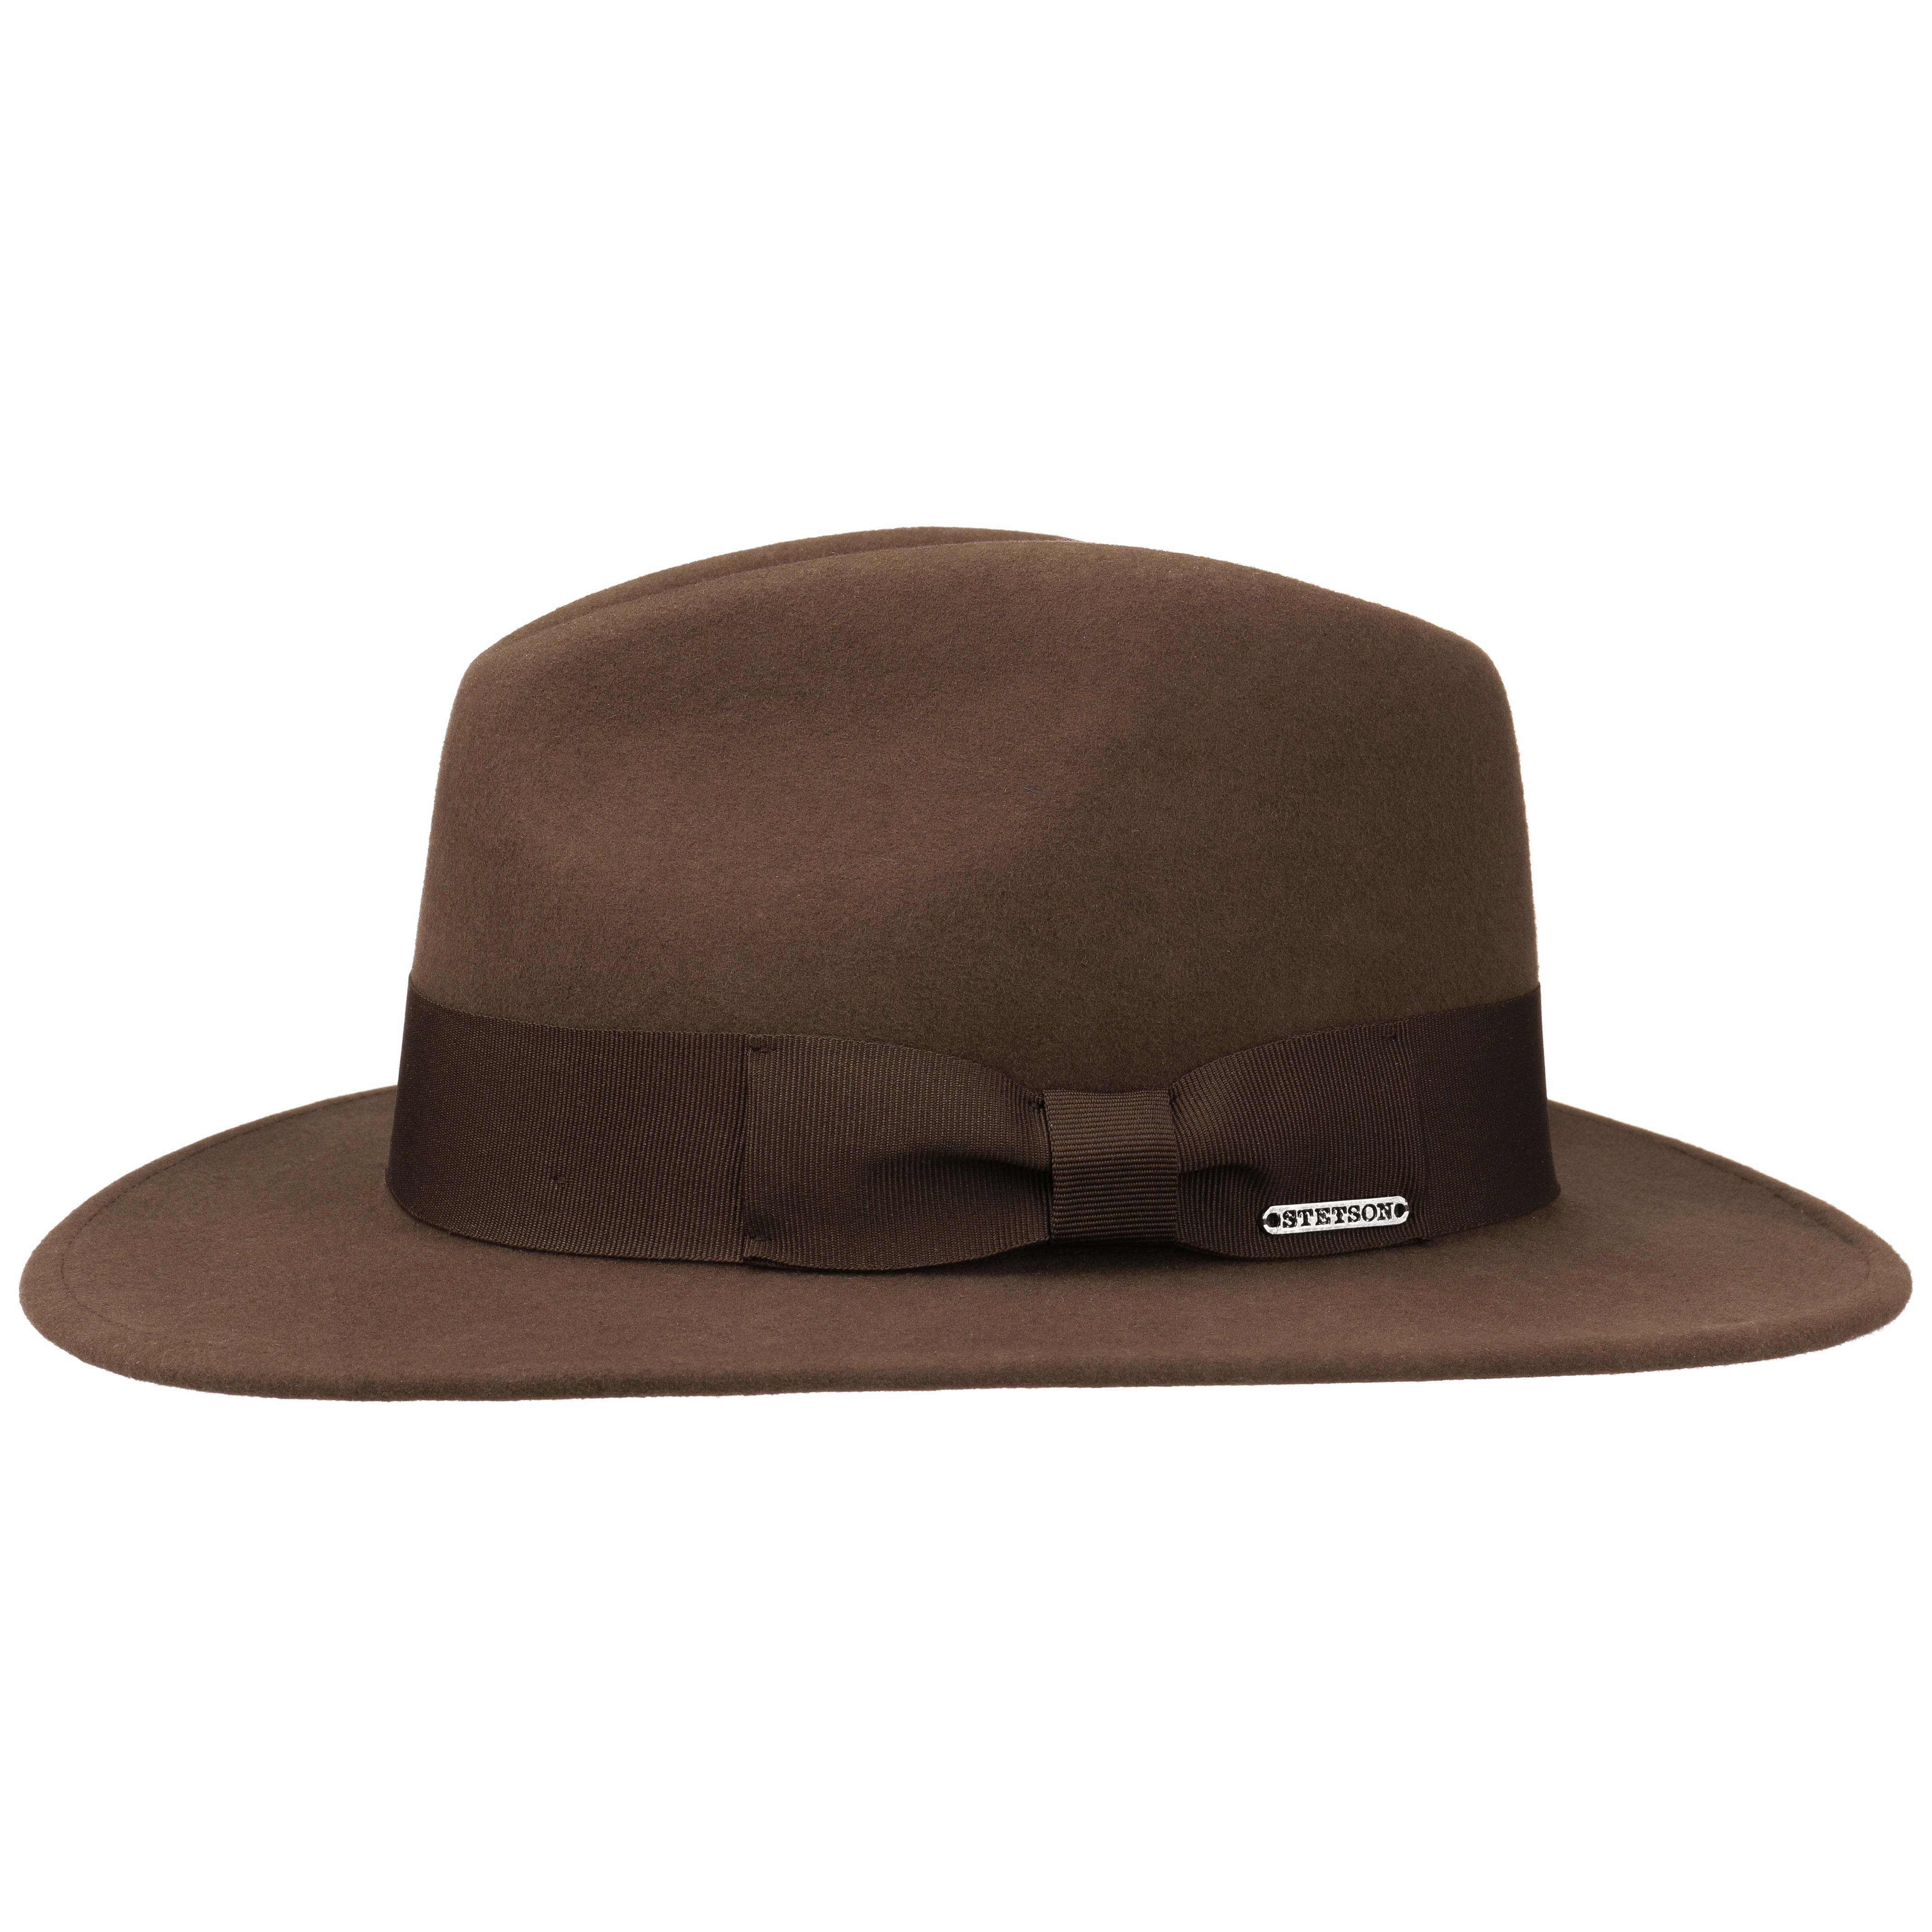 Stetson traveller gyapjú kalap barna  5043c33bb5